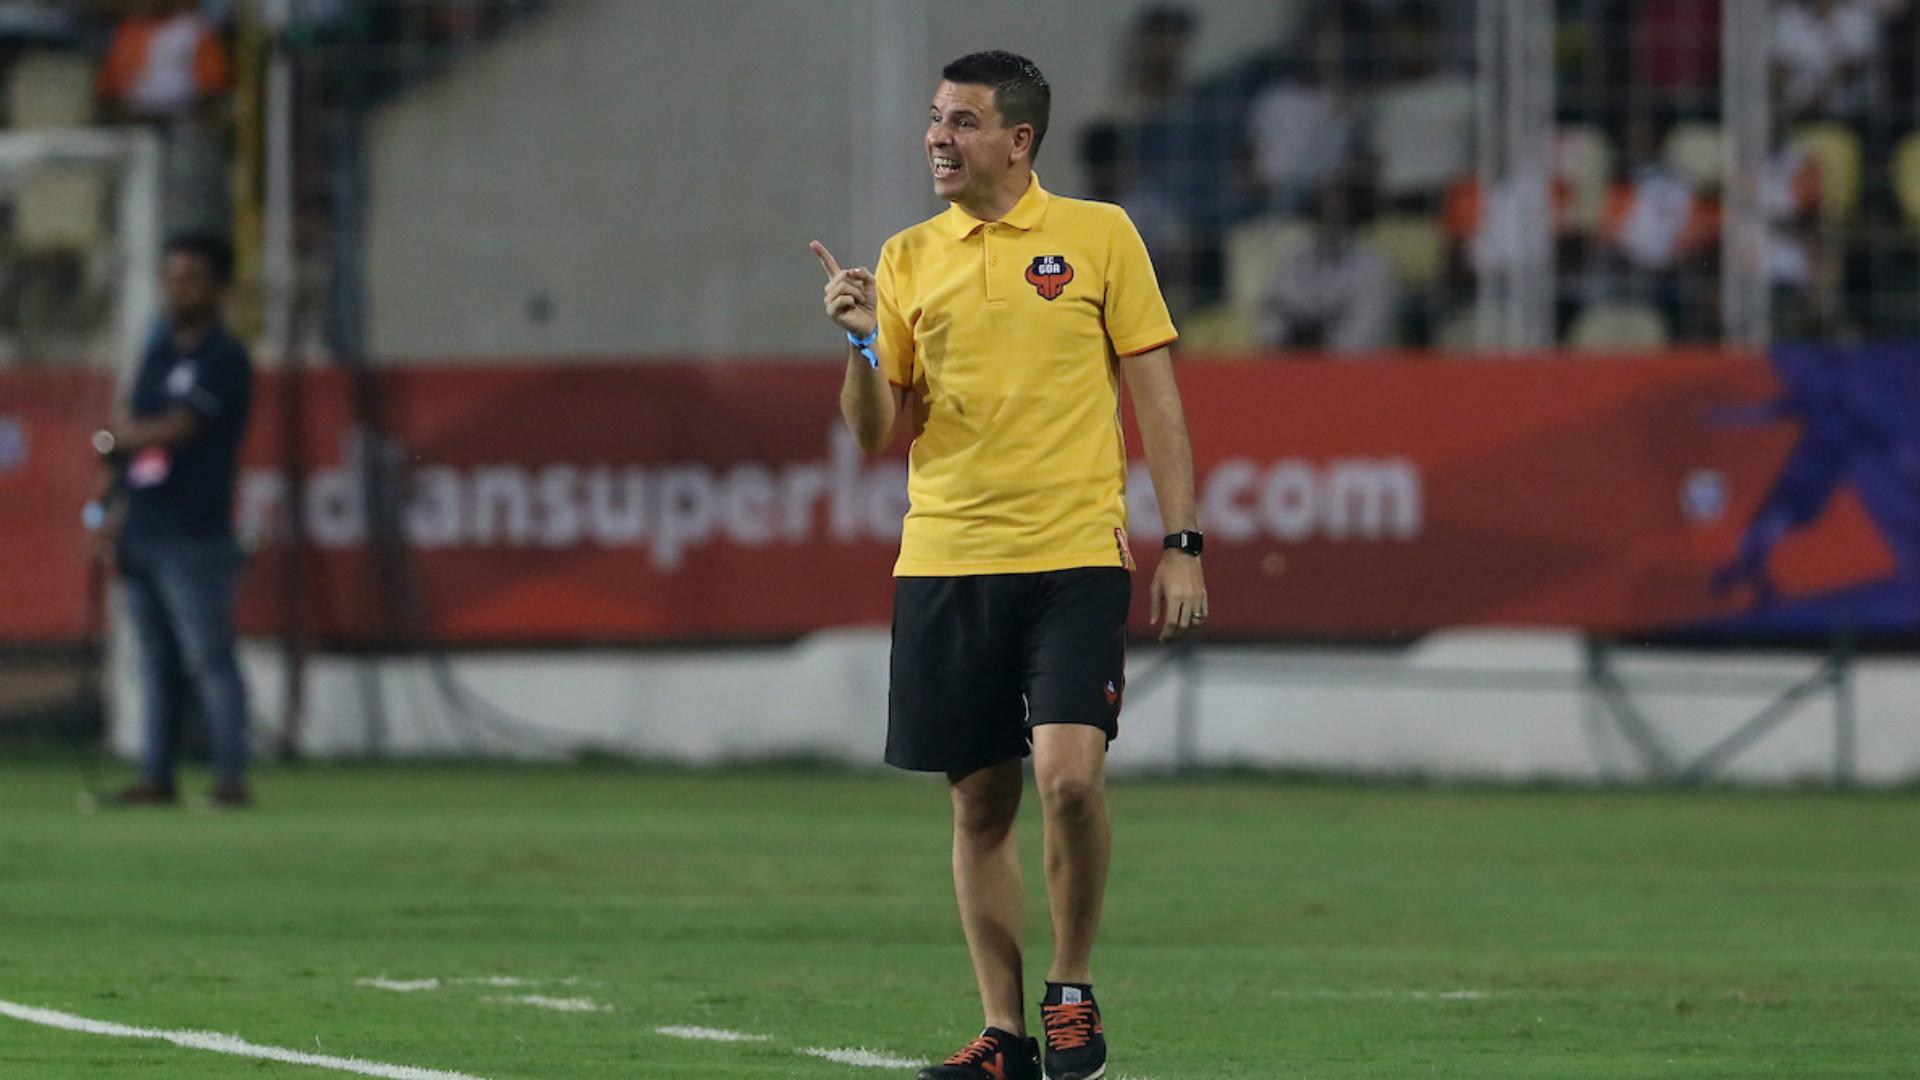 Sergio Loberas Maturity Has Helped Fc Goa Evolve